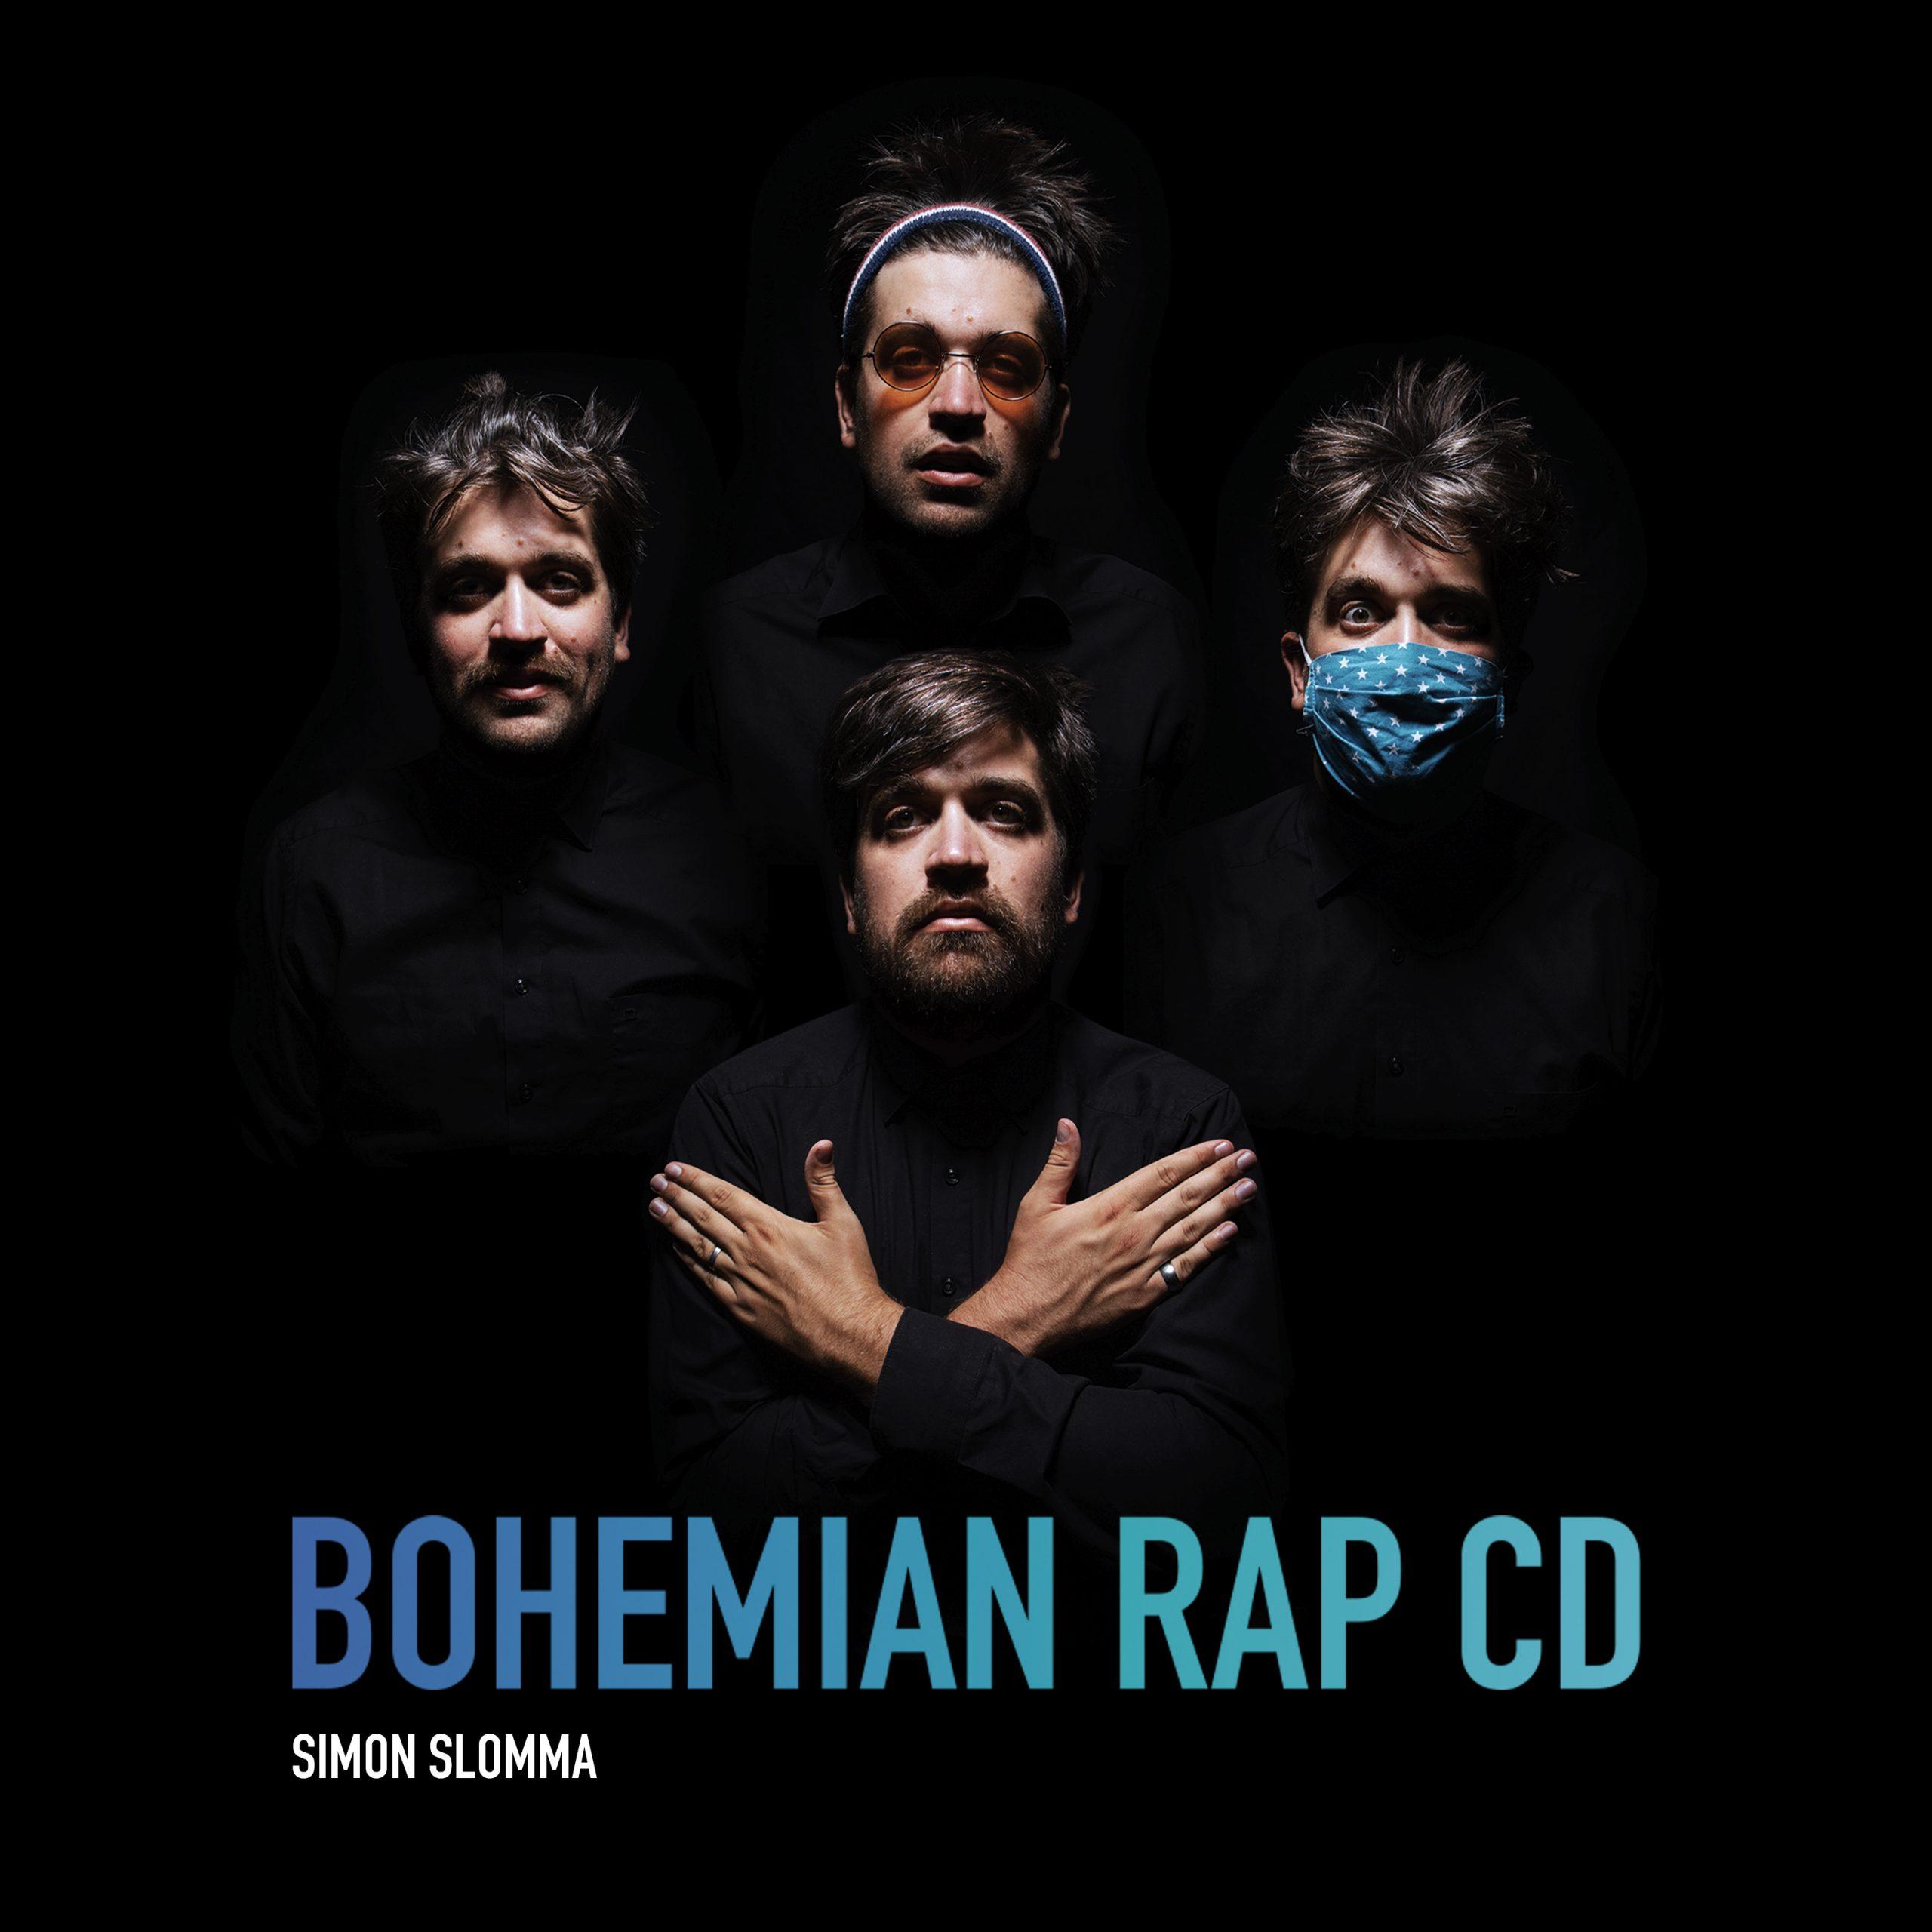 Simon Slomma - Bohemian Rap CD (realease Show)